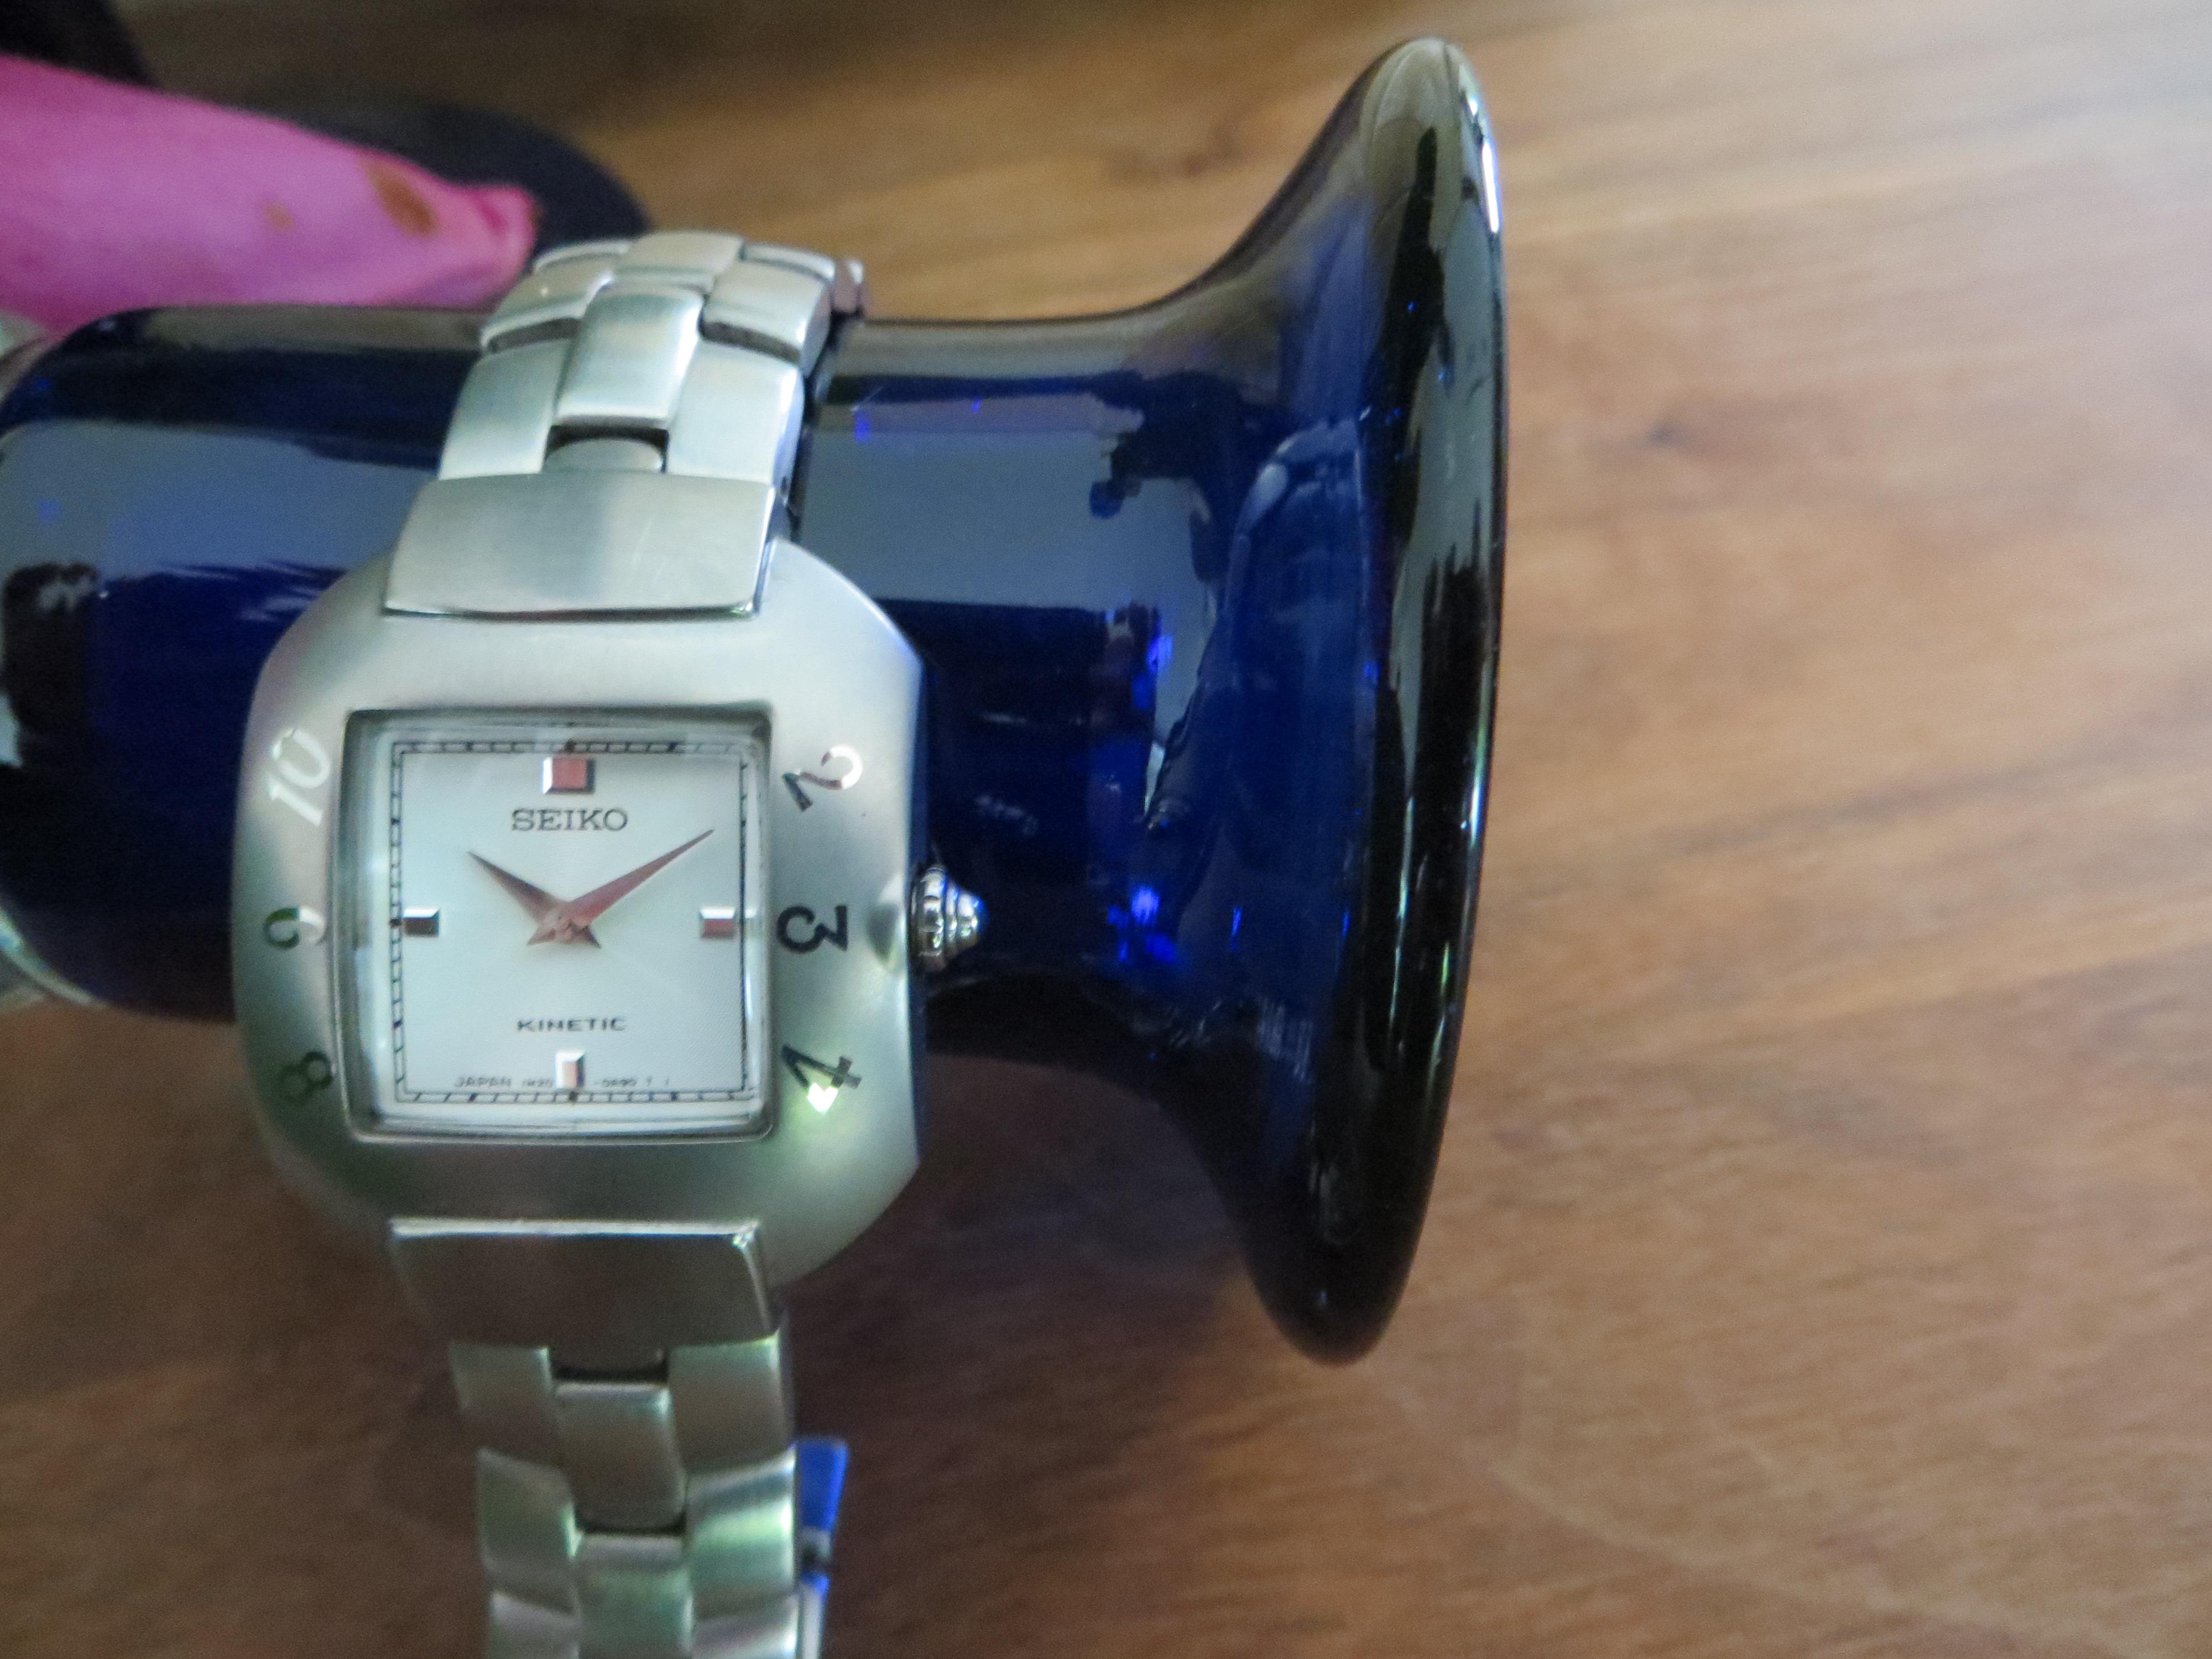 Uitgelezene Seiko Dames horloge Kinetic Design limited XE-39